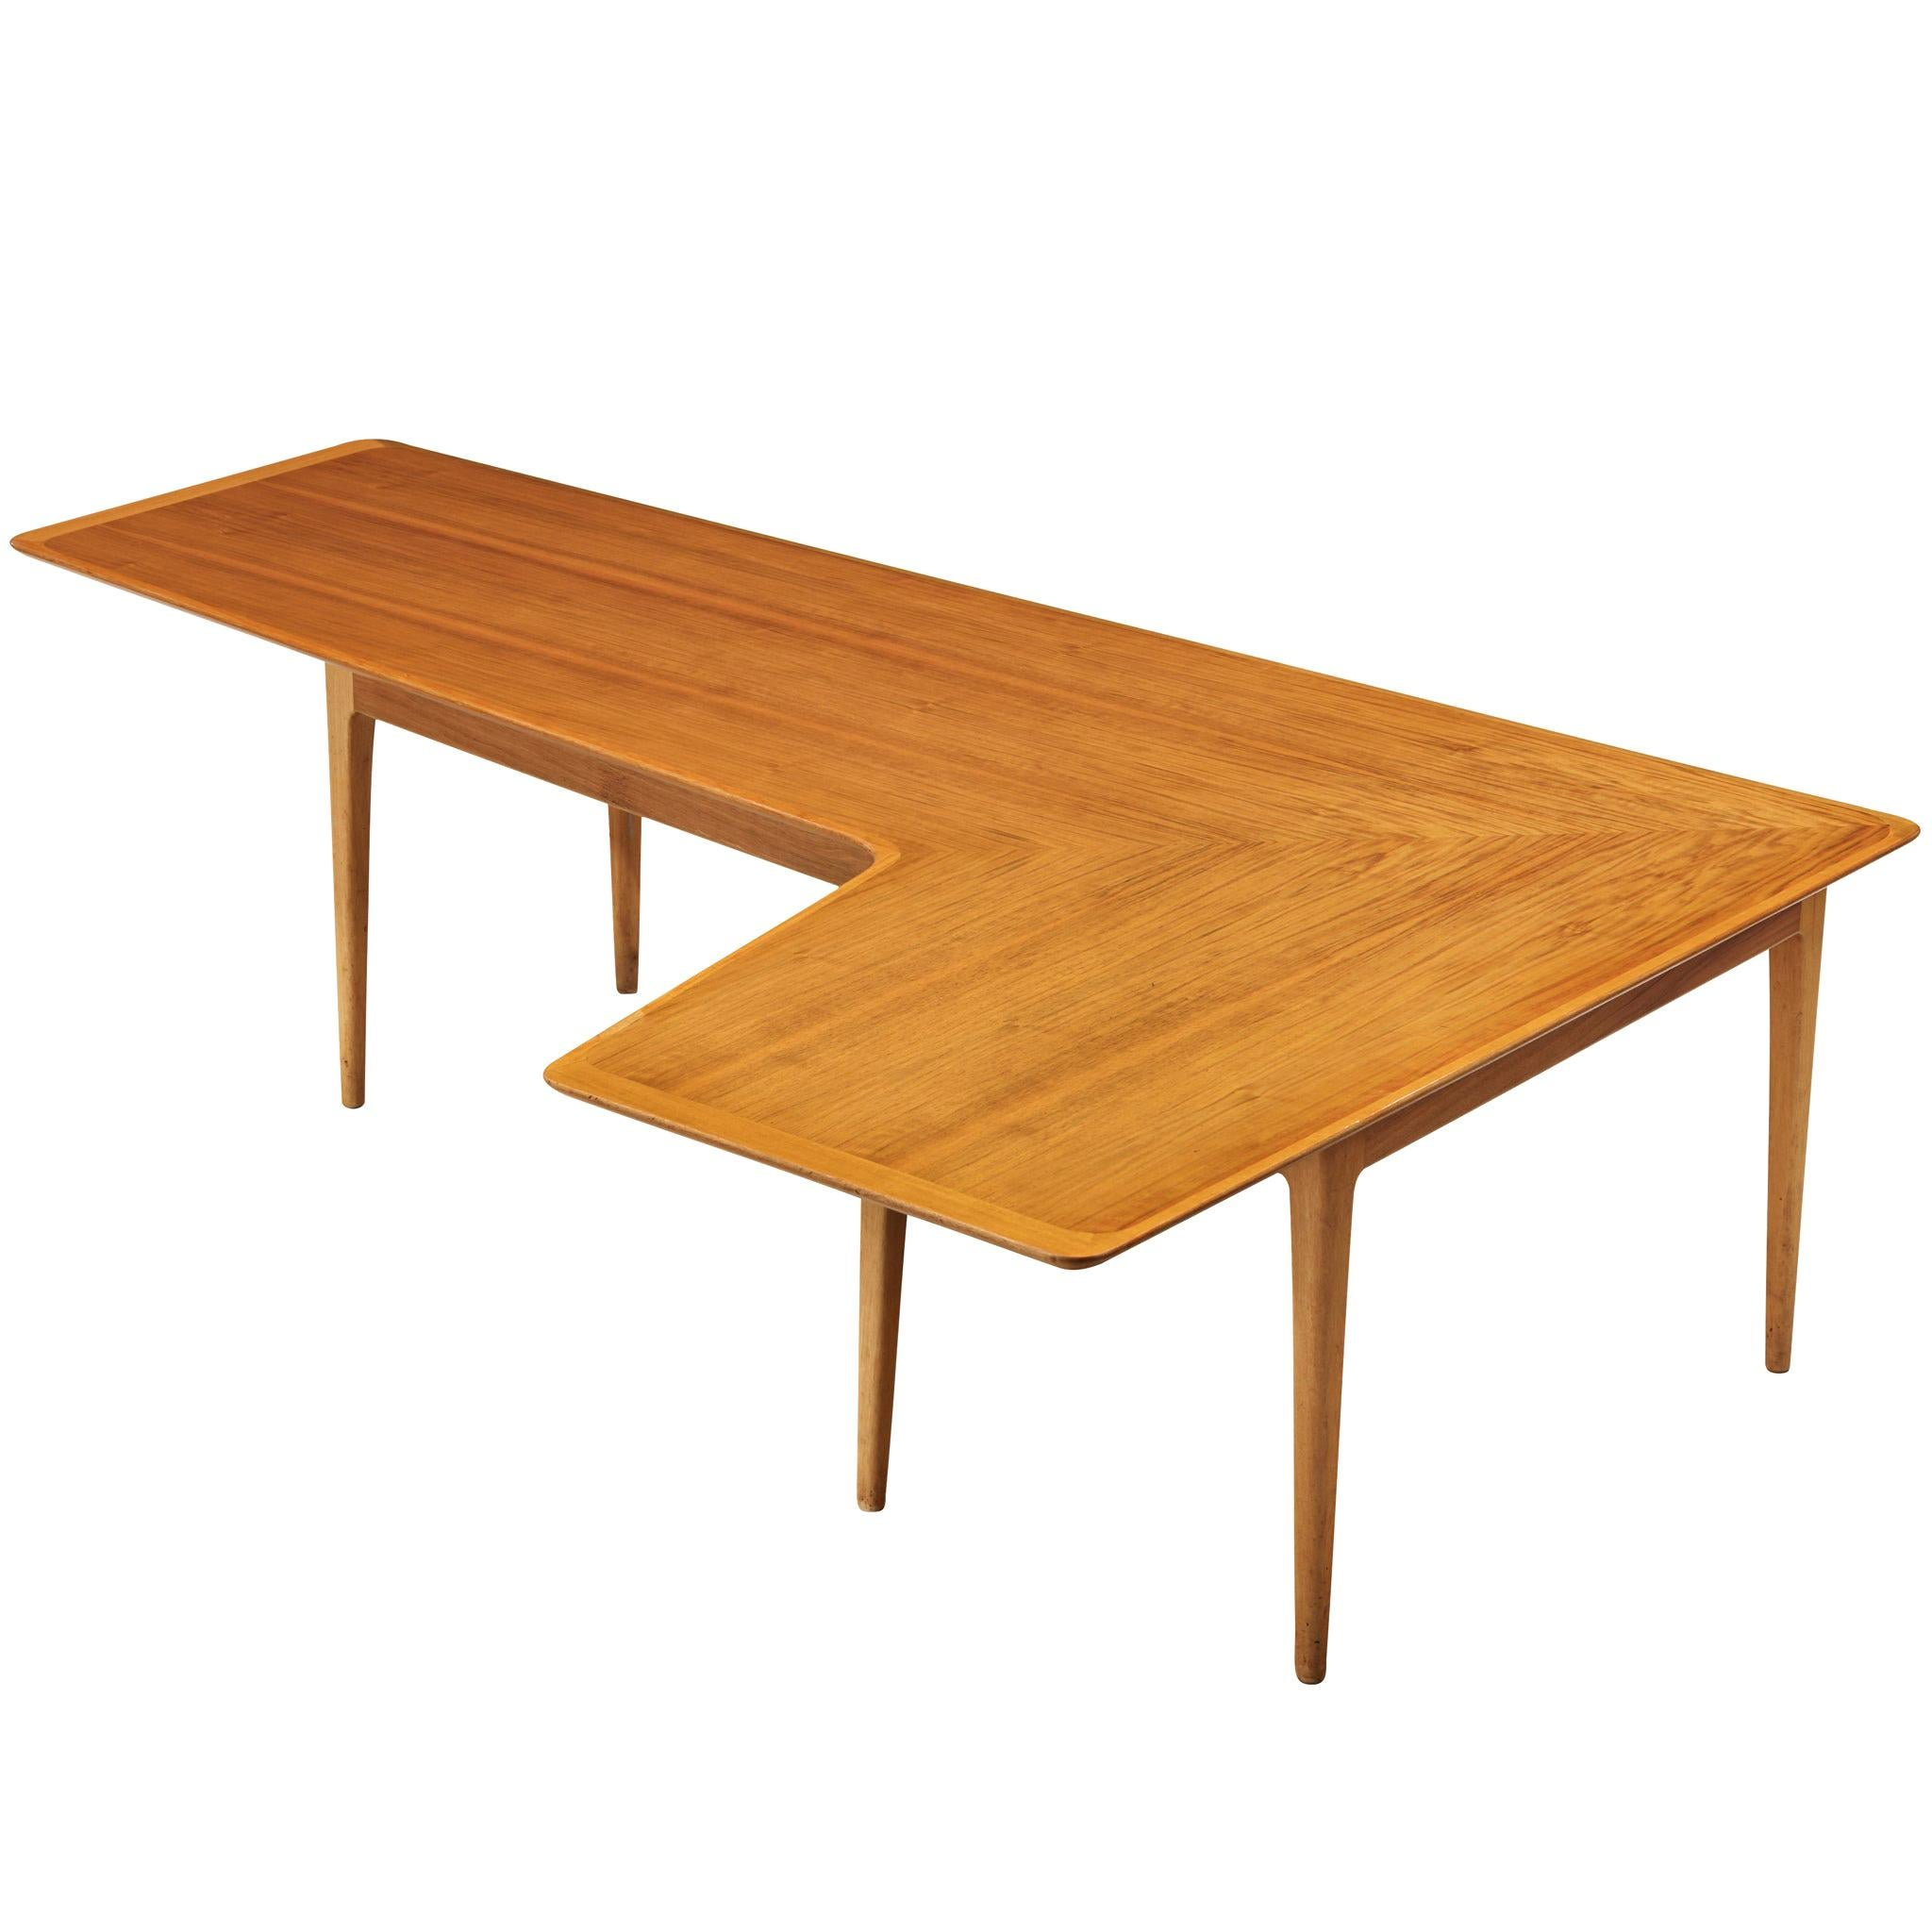 Danish Freeform Coffee Table in Pine